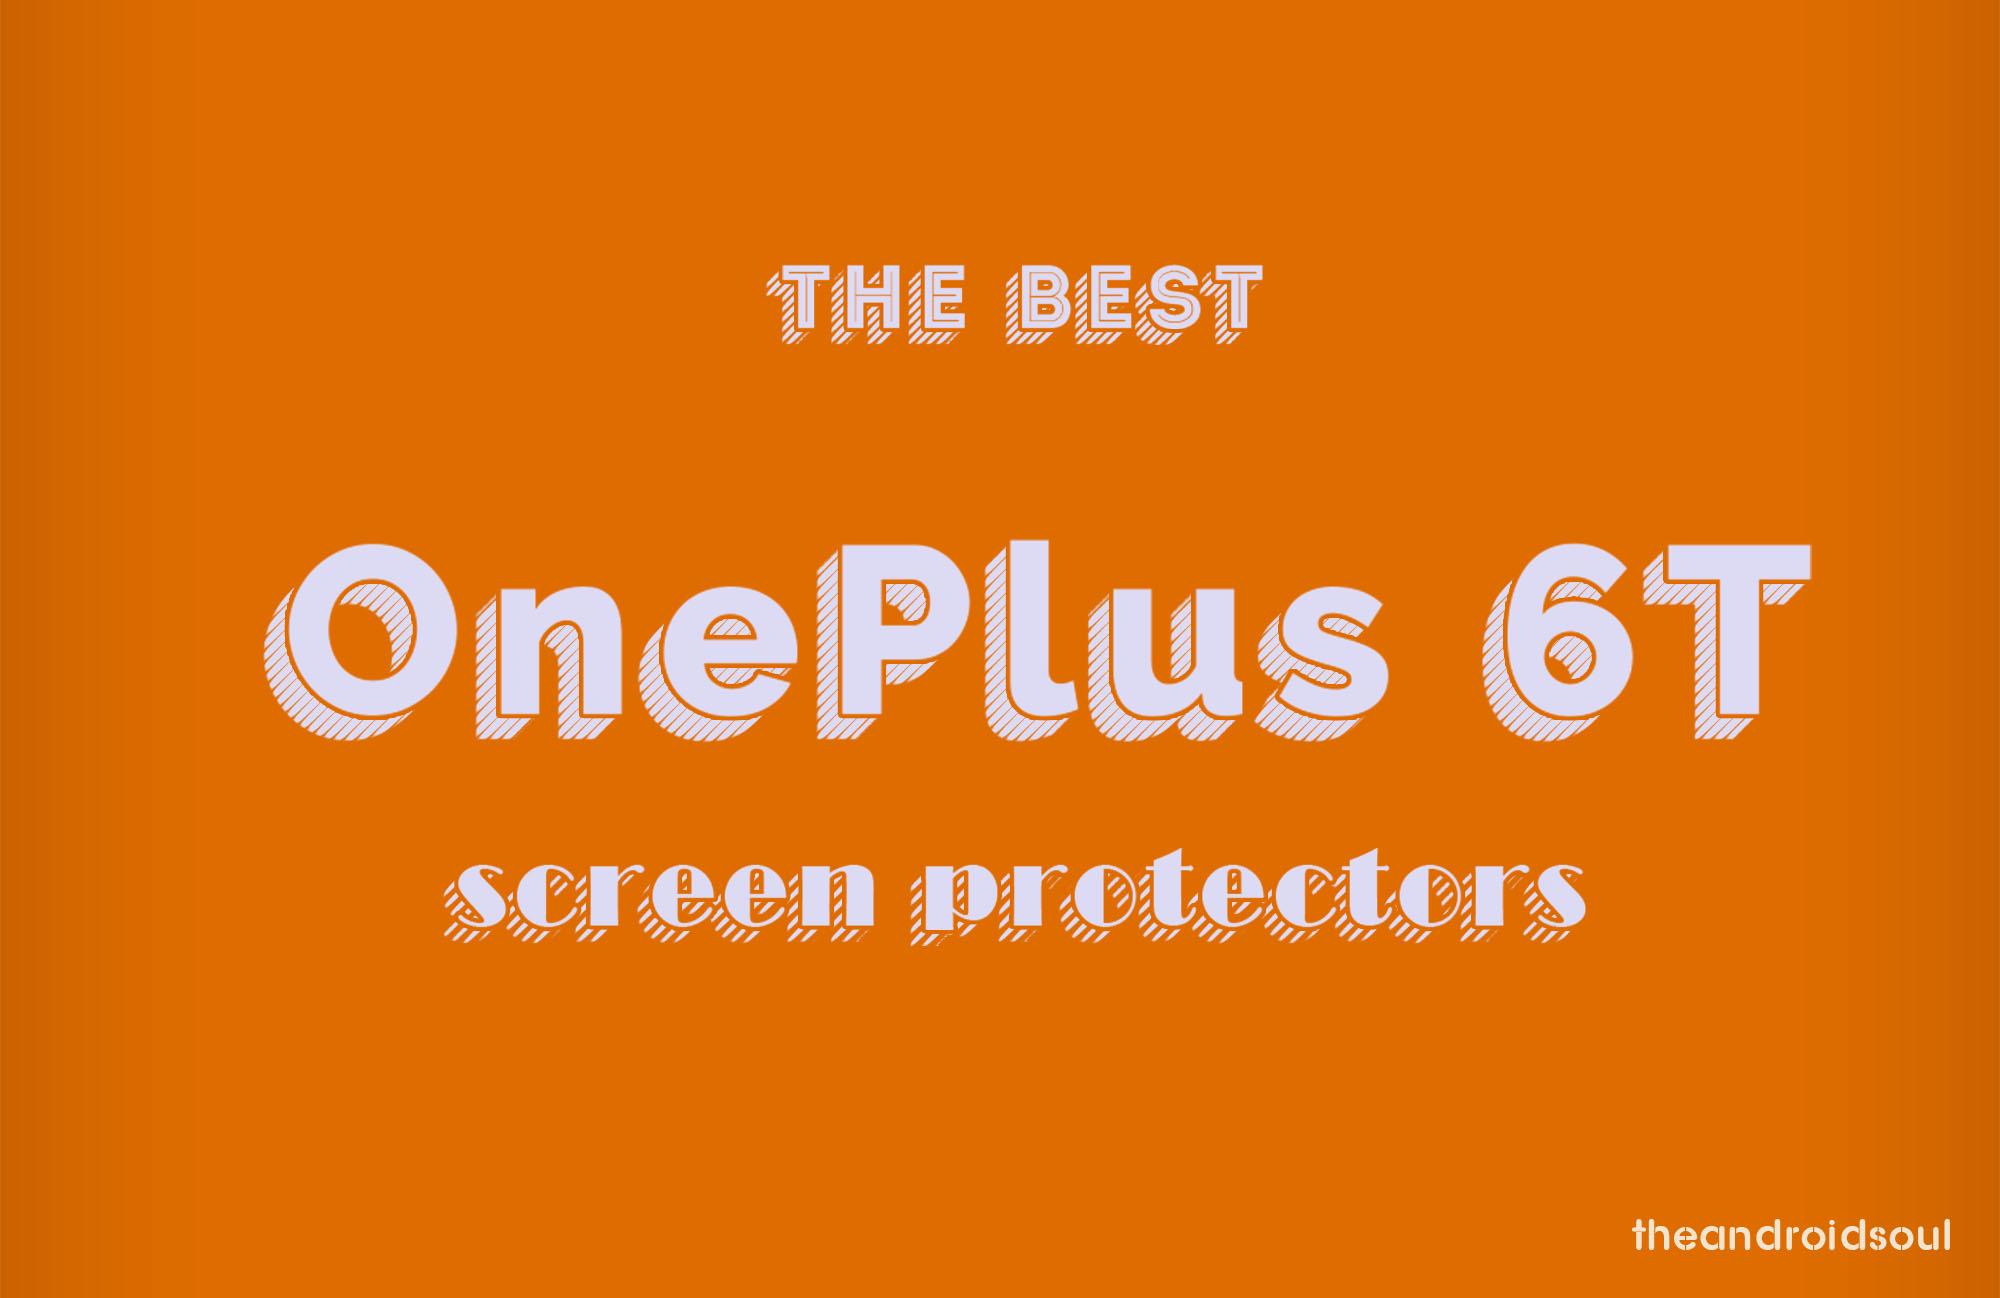 OnePlus 6T screen protectors